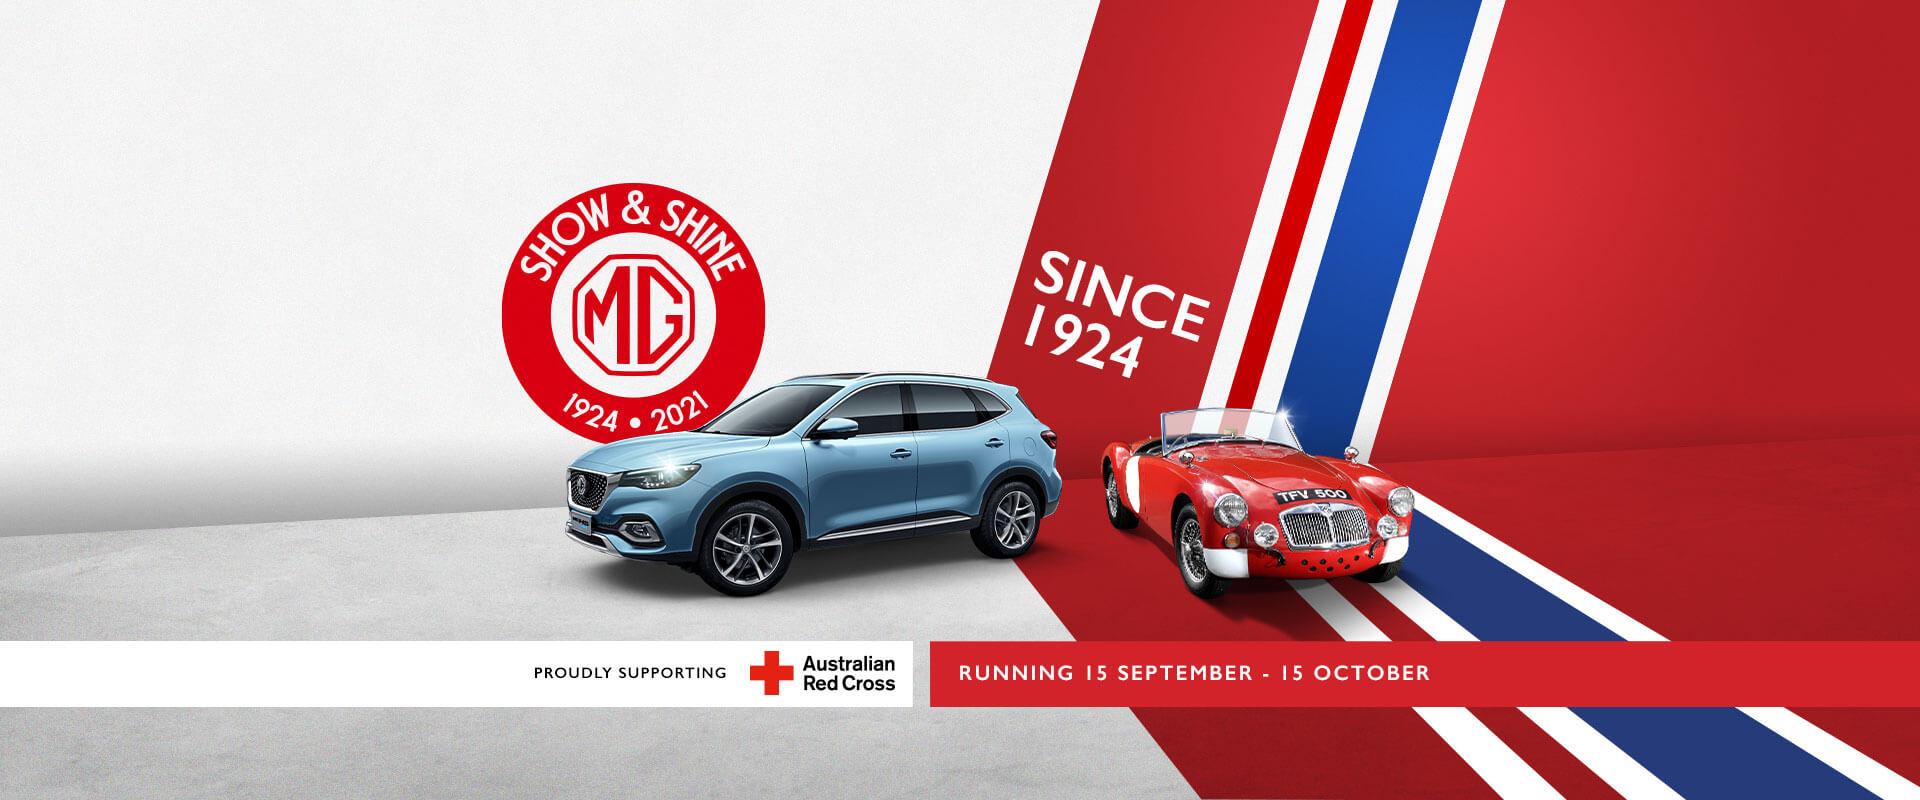 MG Show and Shine 2021. Running 15 September - 15 October